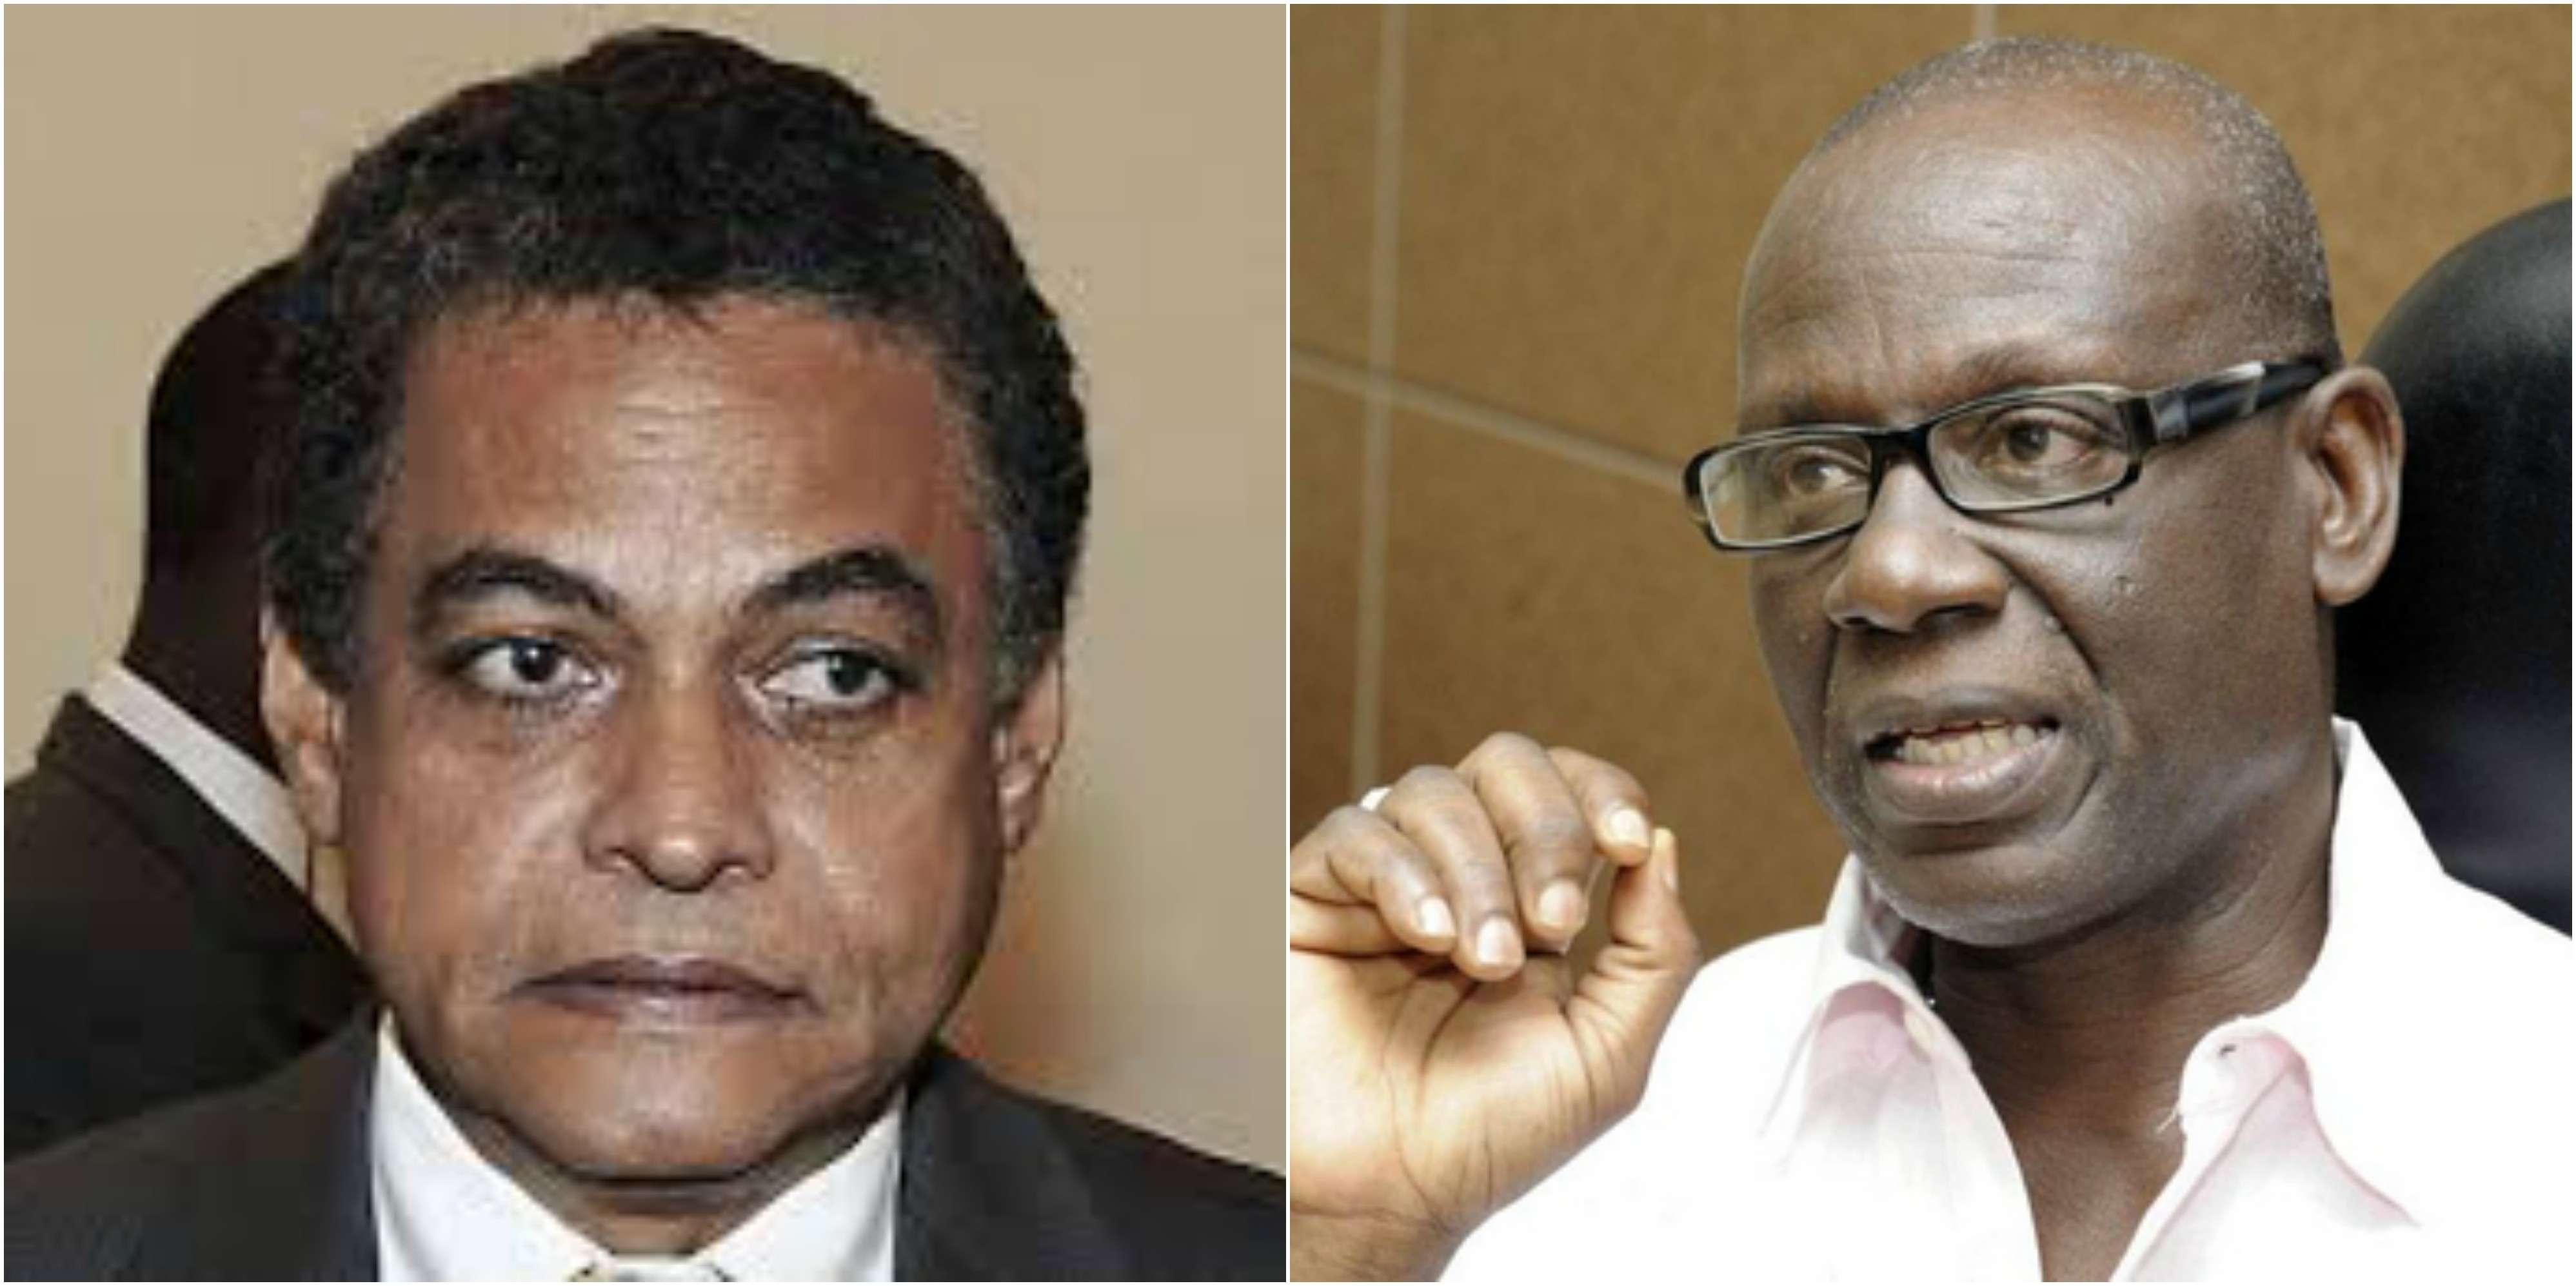 McKenzie & Arscott Clash in Parliament over Hurricane Matthew Response